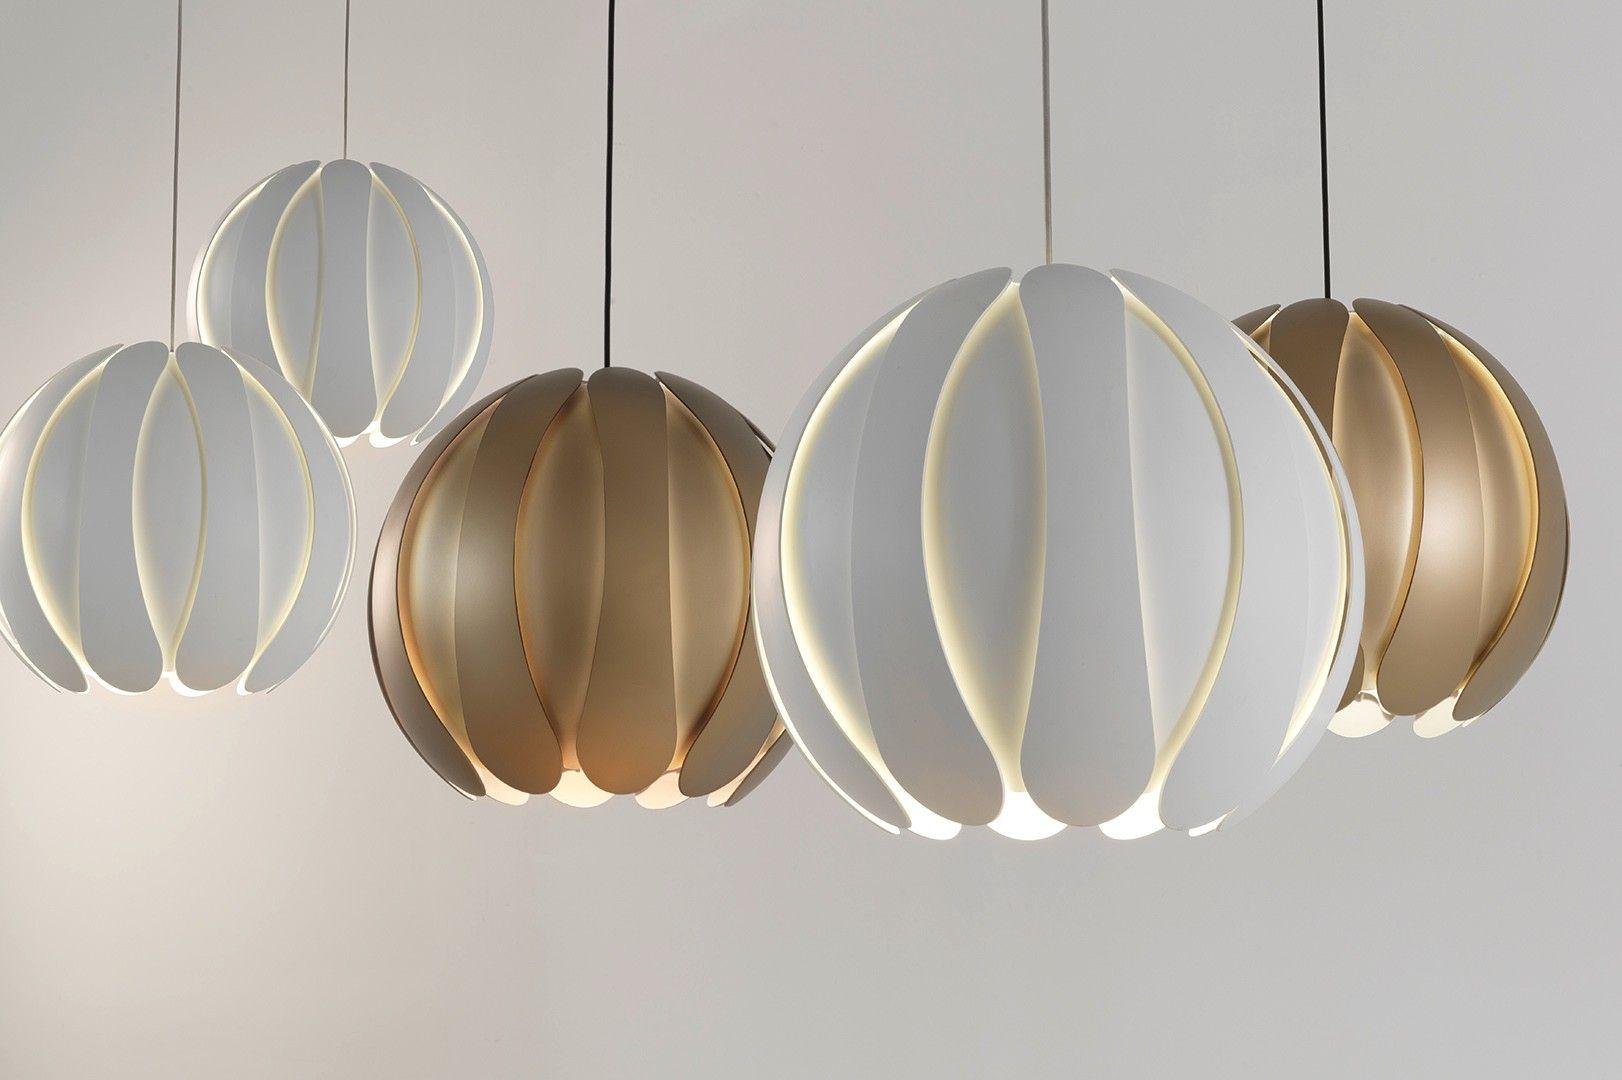 Metal Closed Flower Pendant Light Ceiling Light Fittings Pendant Light Light Fittings